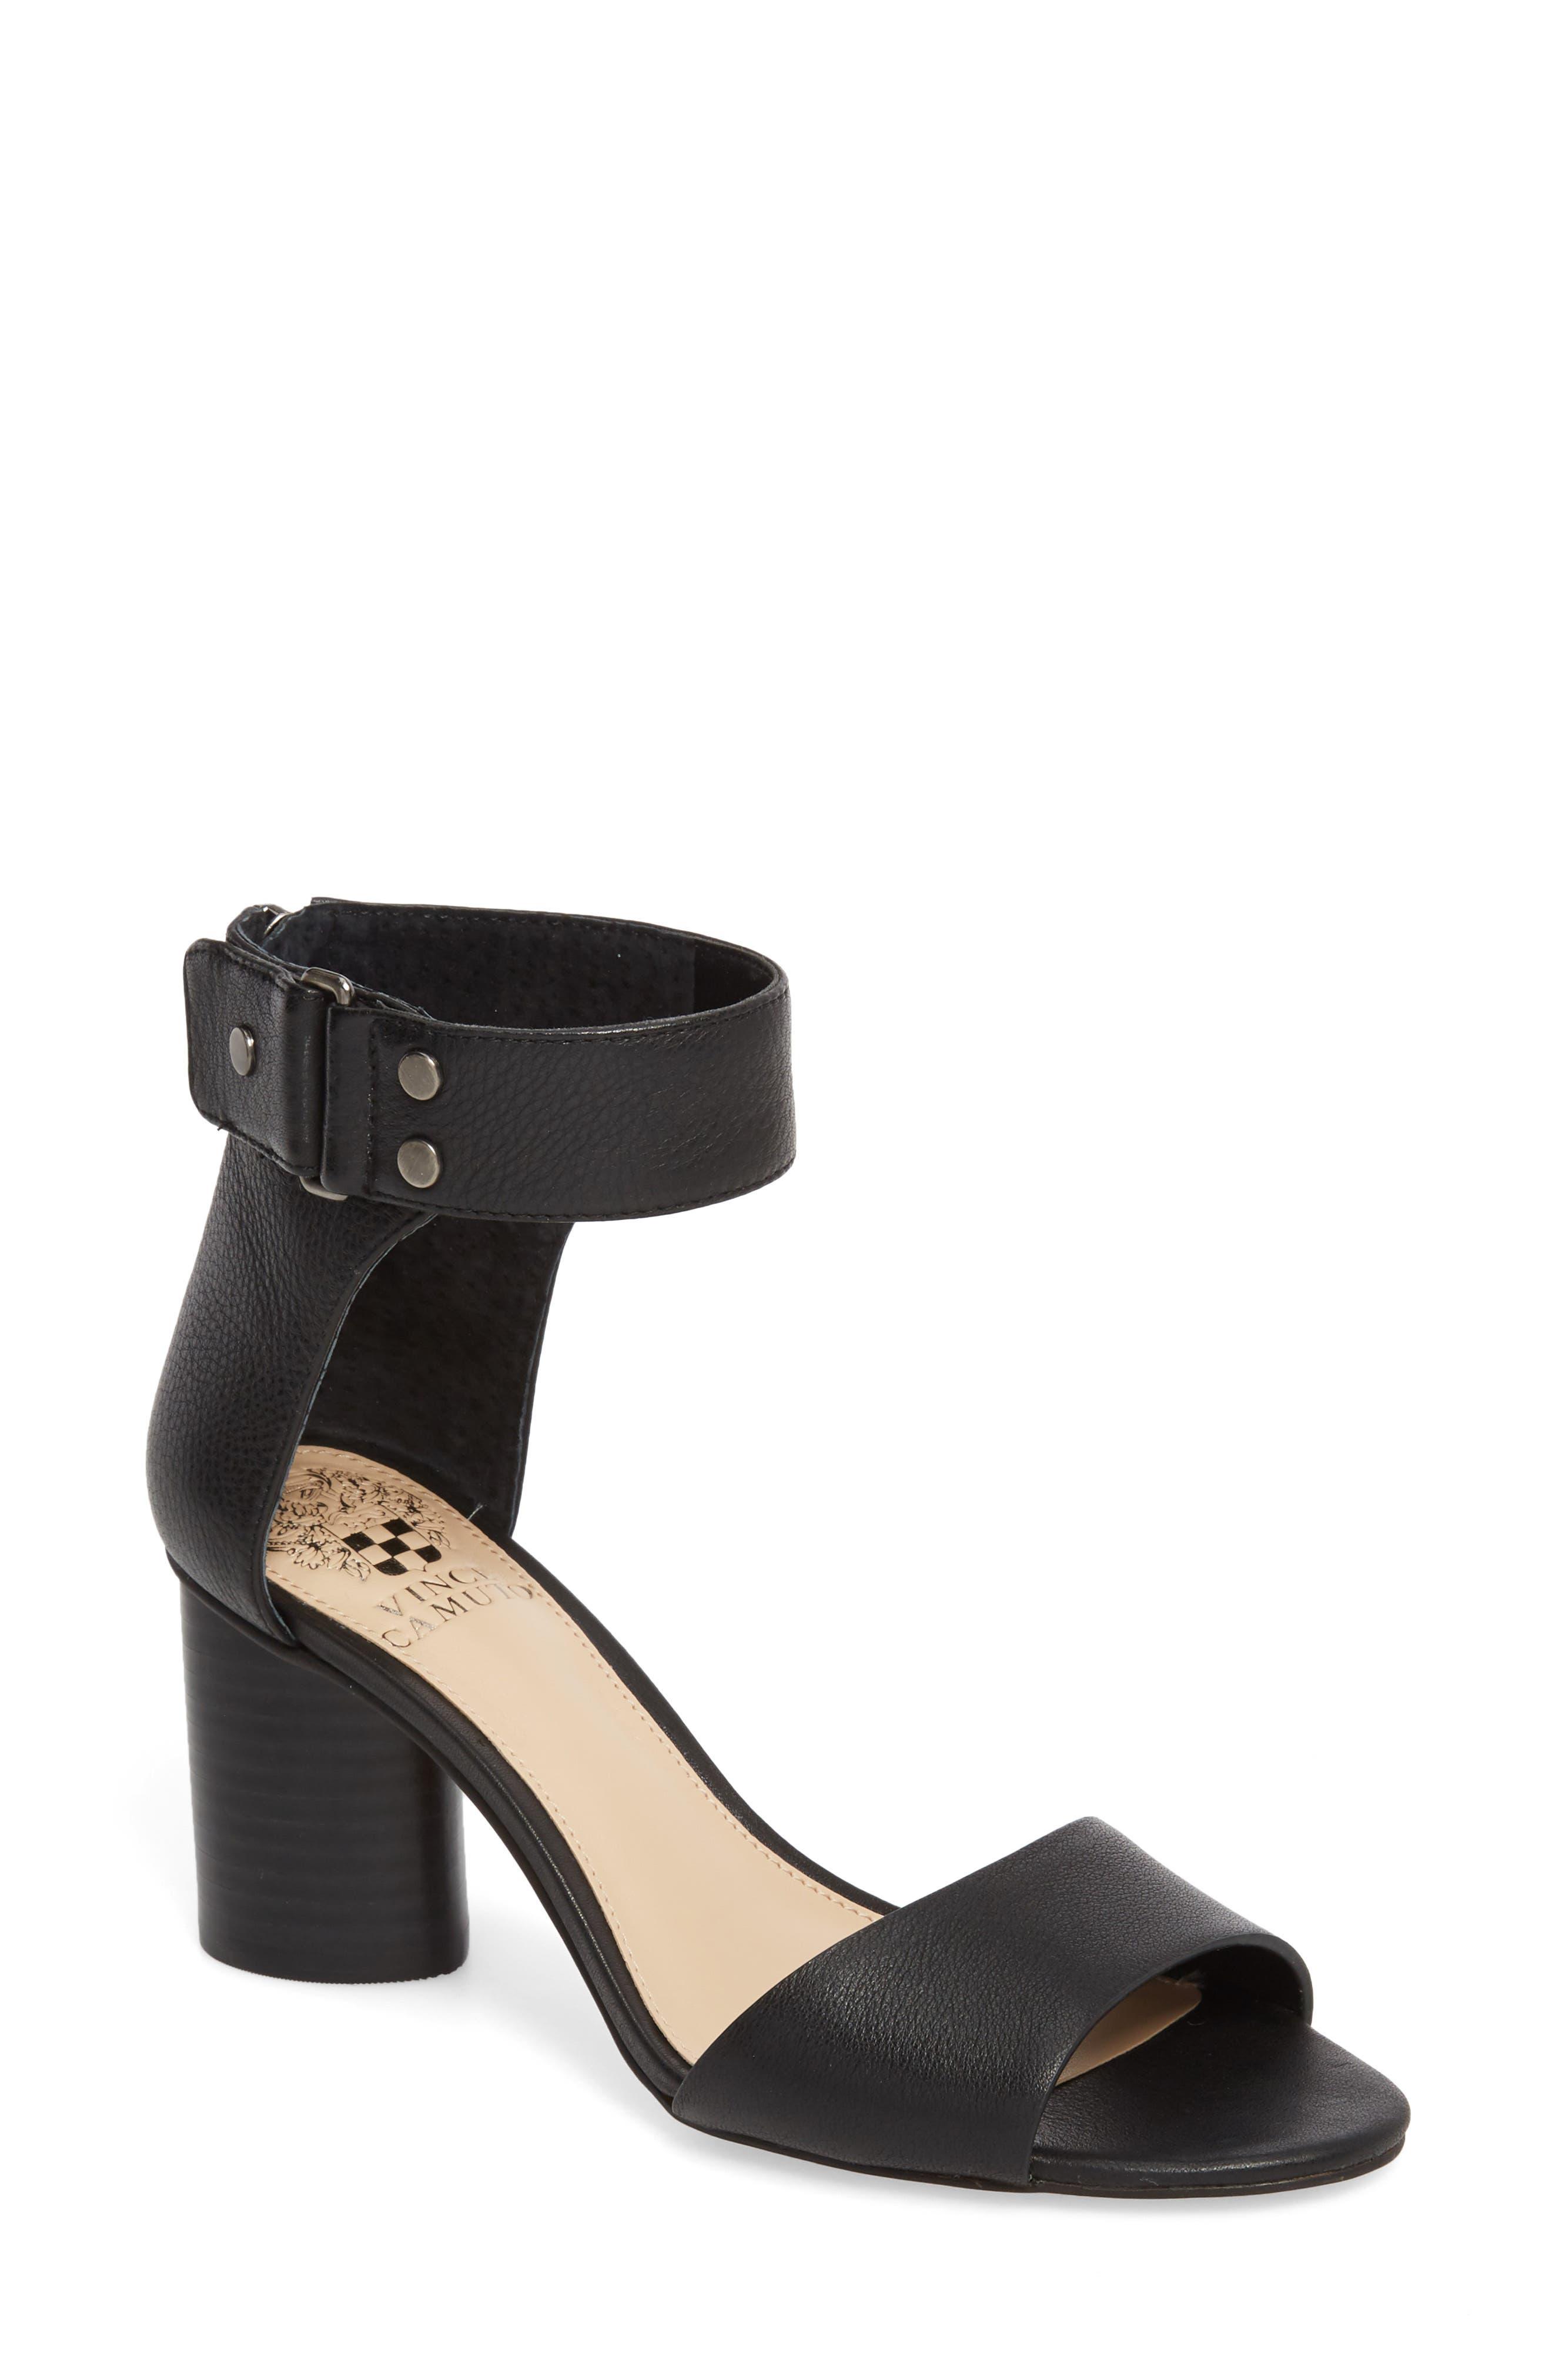 Jannali Ankle Strap Sandal,                         Main,                         color, BLACK LEATHER